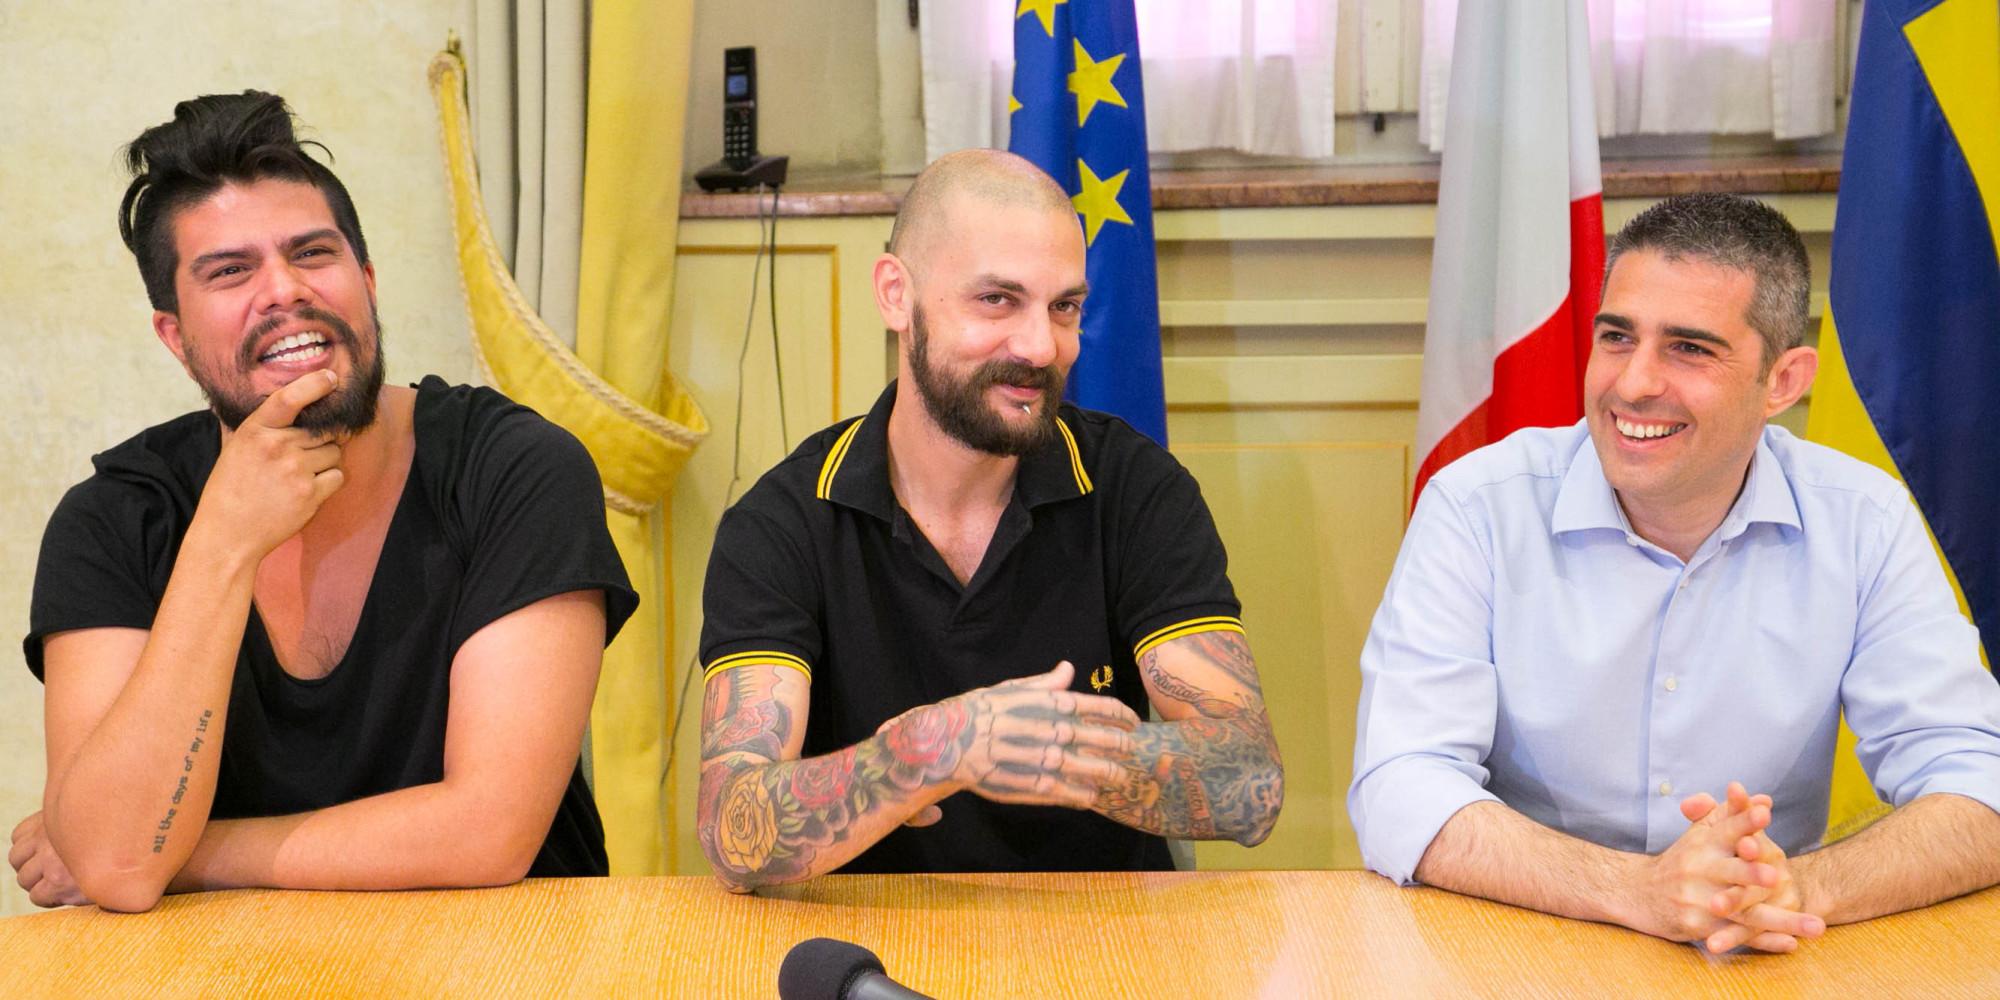 ITALIAN GAY VIDEOS ESCORT TORINO PREZZI